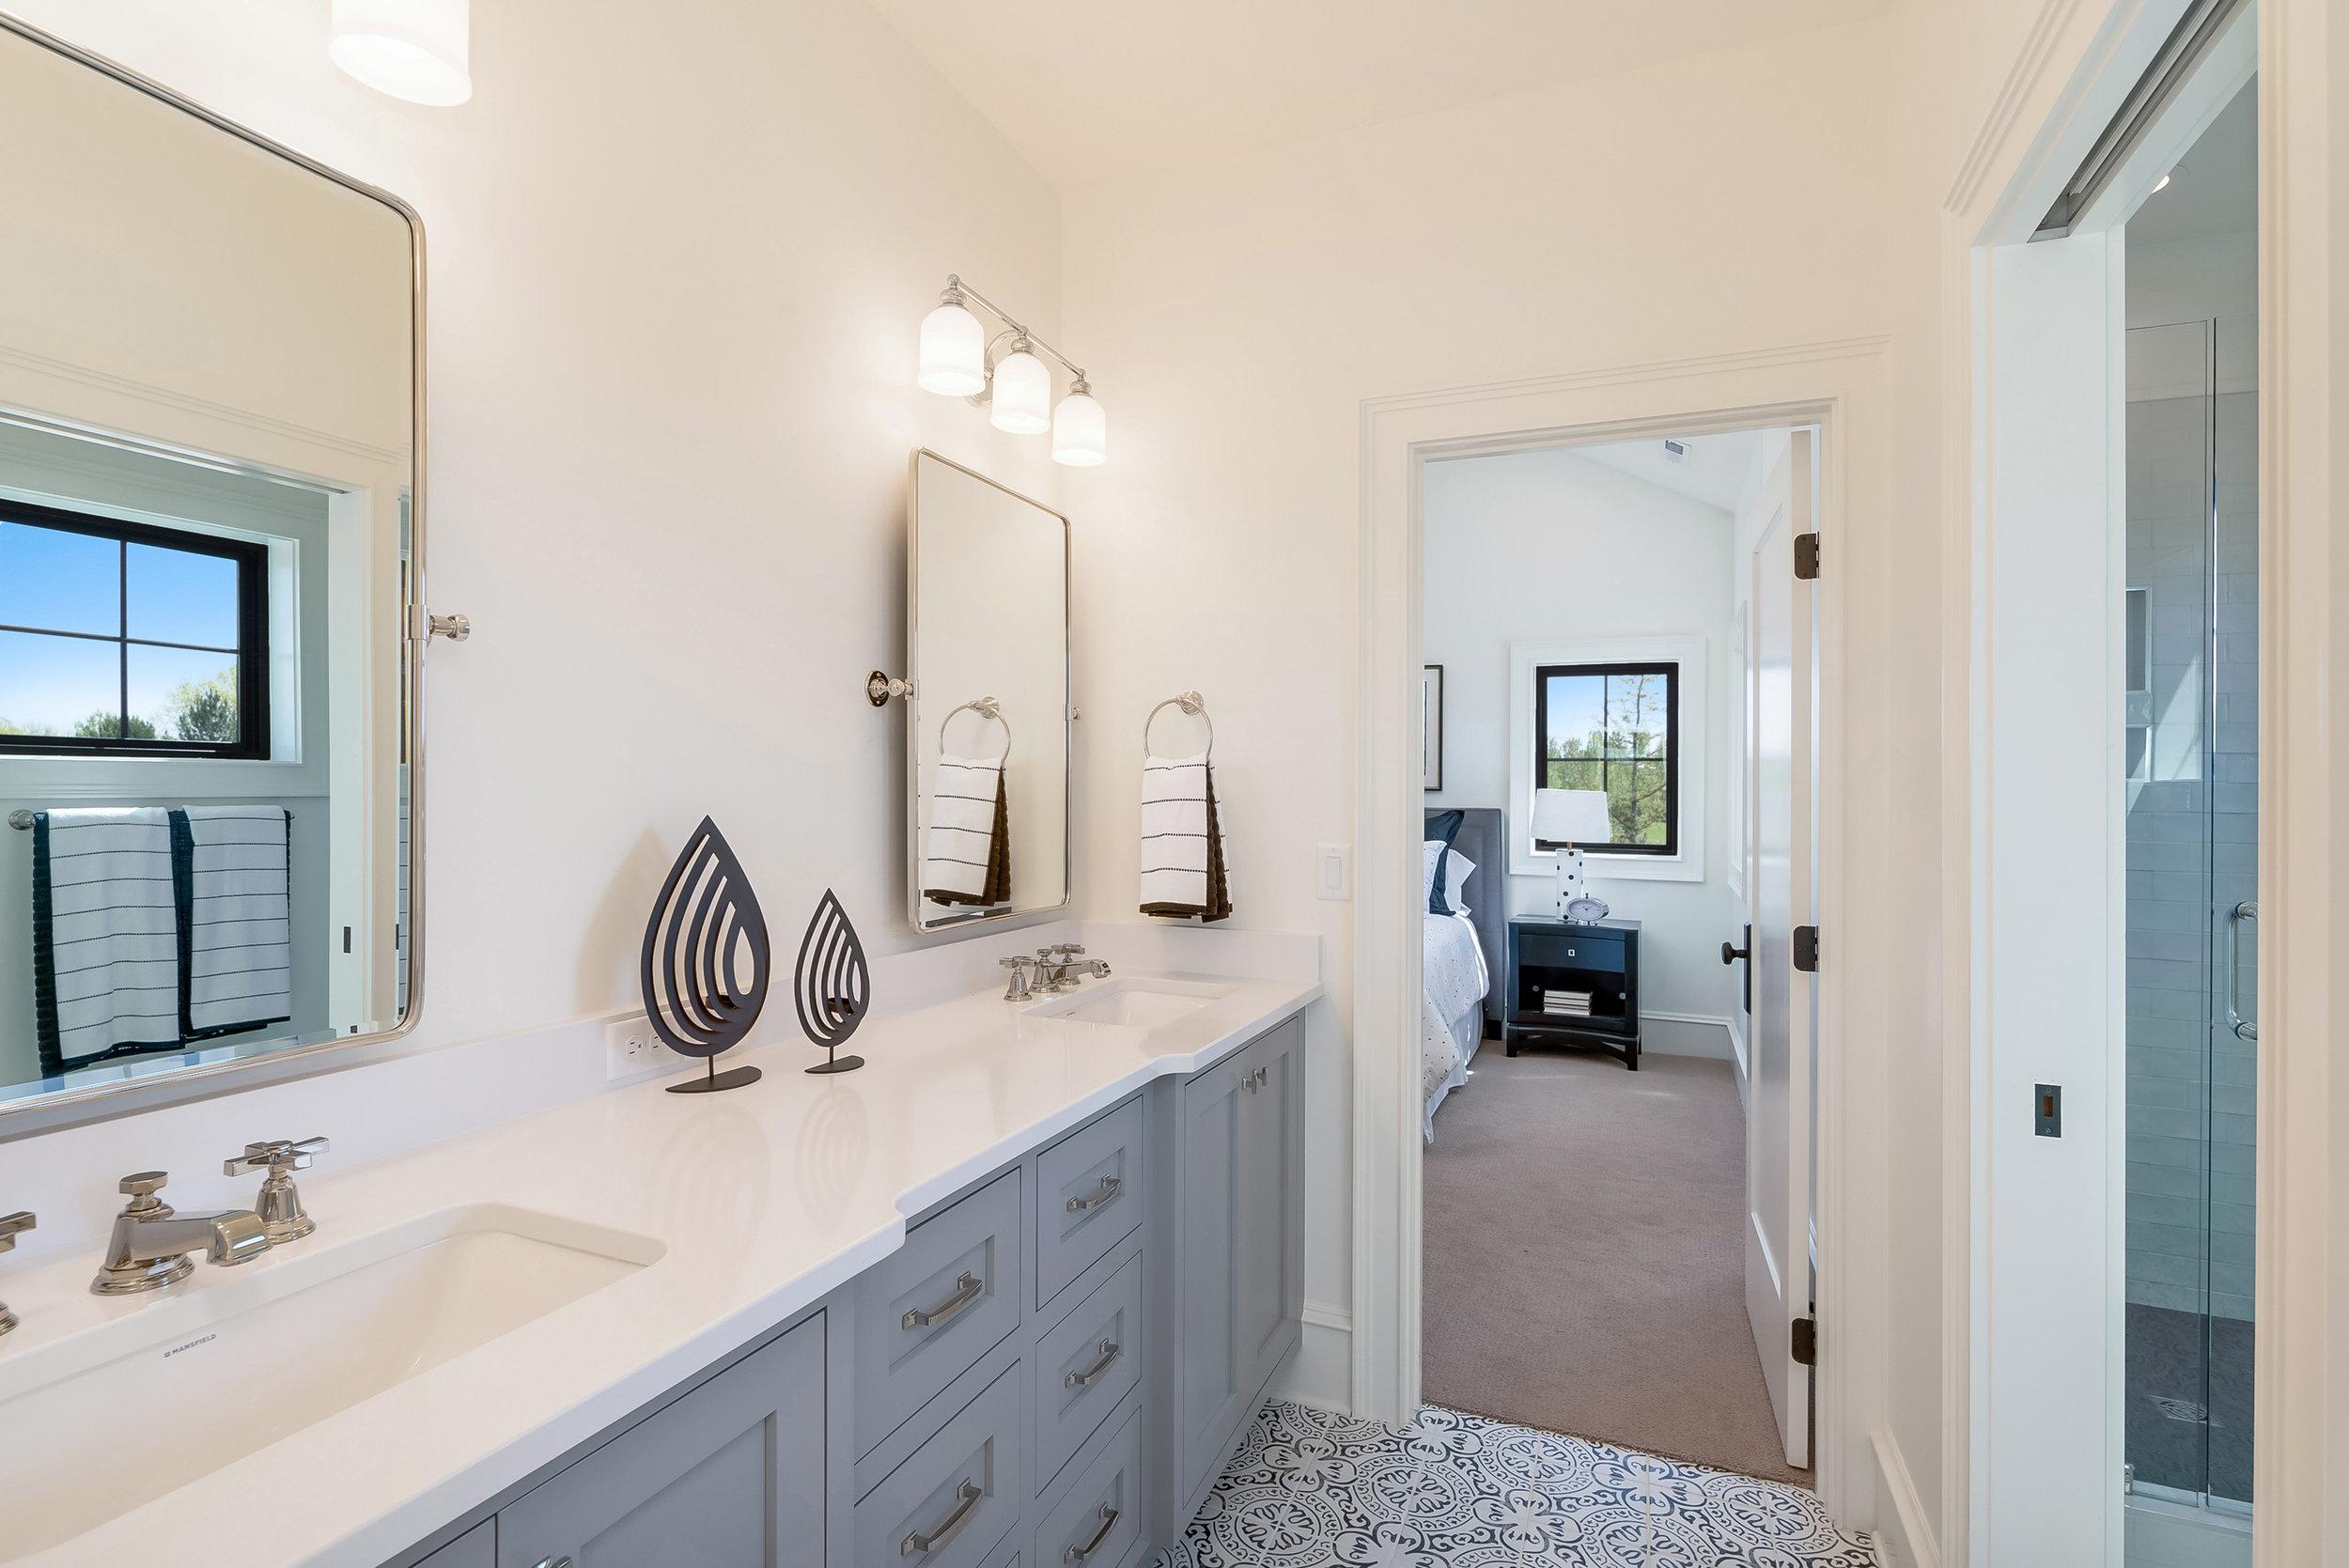 23-Bathroom.jpg